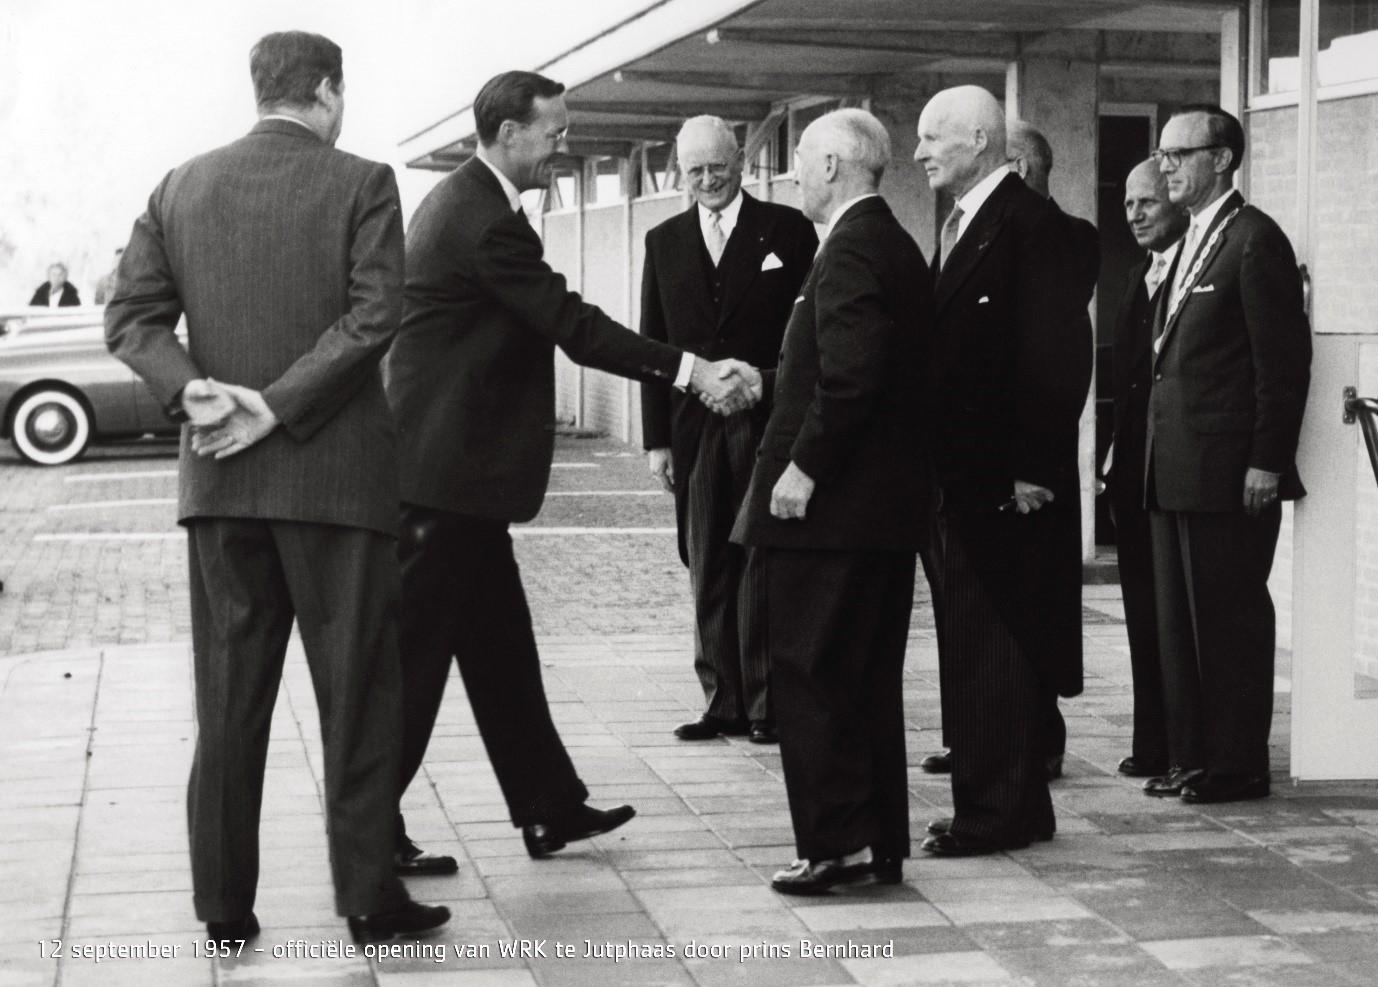 12 september 1957 – Officiële opening van WRK te Jutphaas door prins Bernhard